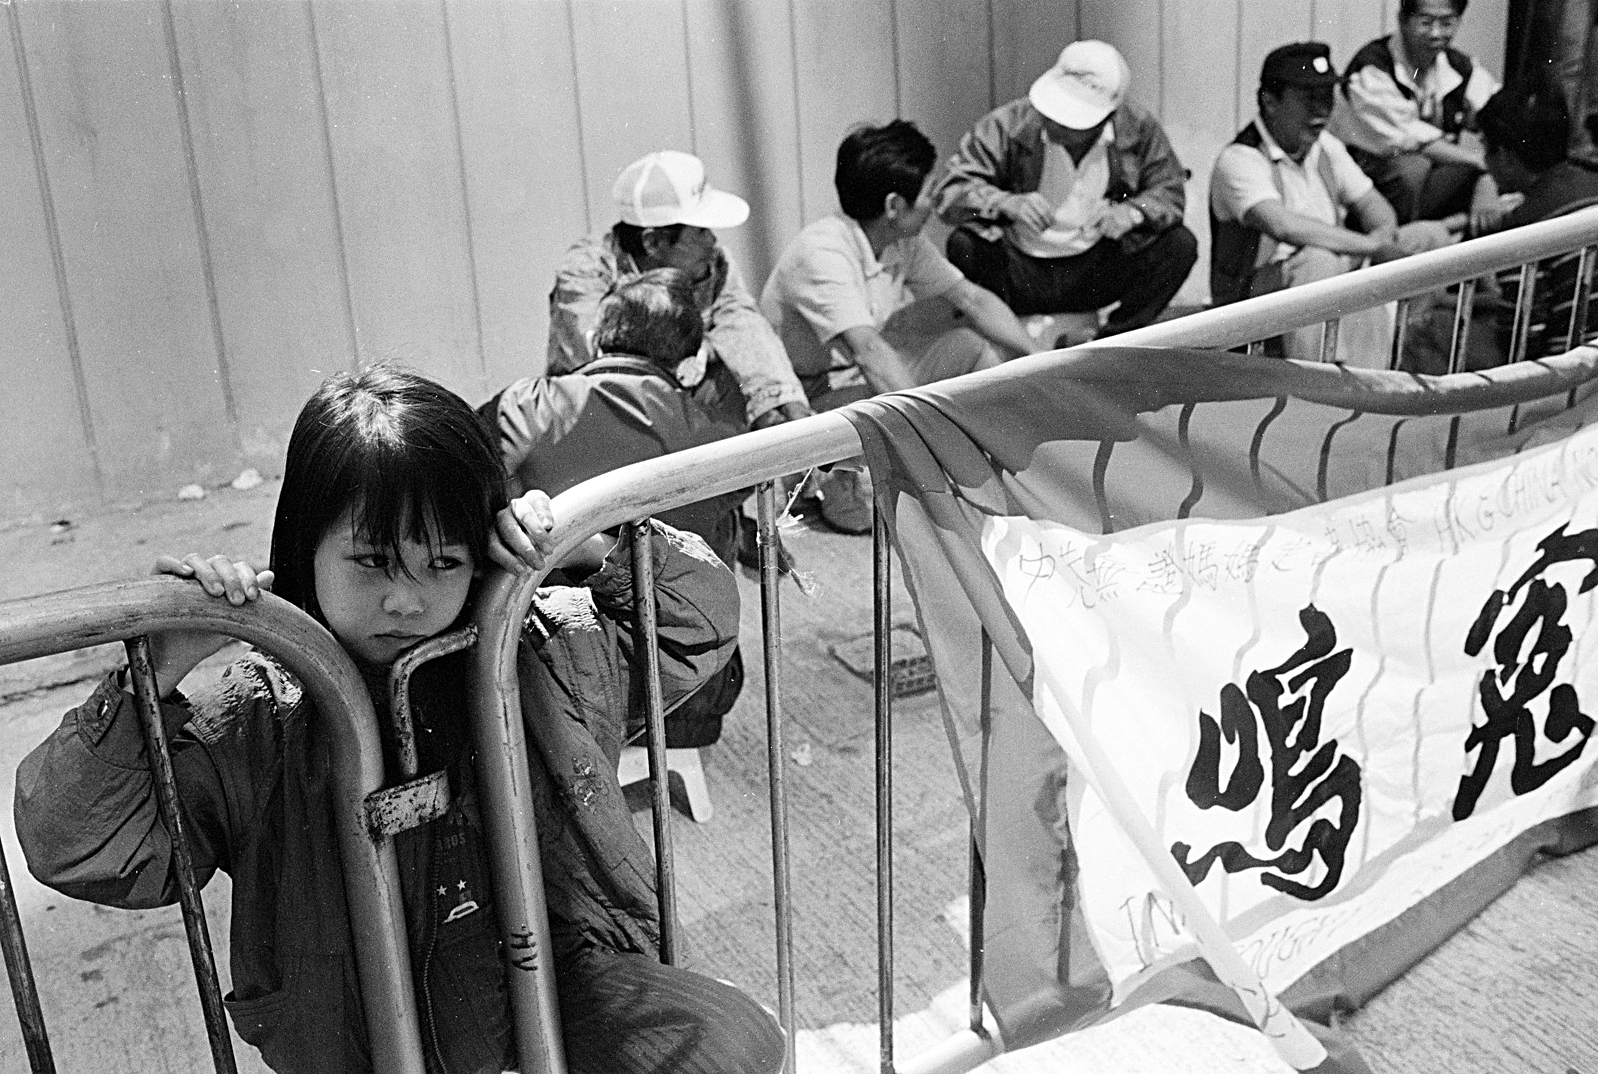 hk_immigration_protest_untitled_20130805.jpg